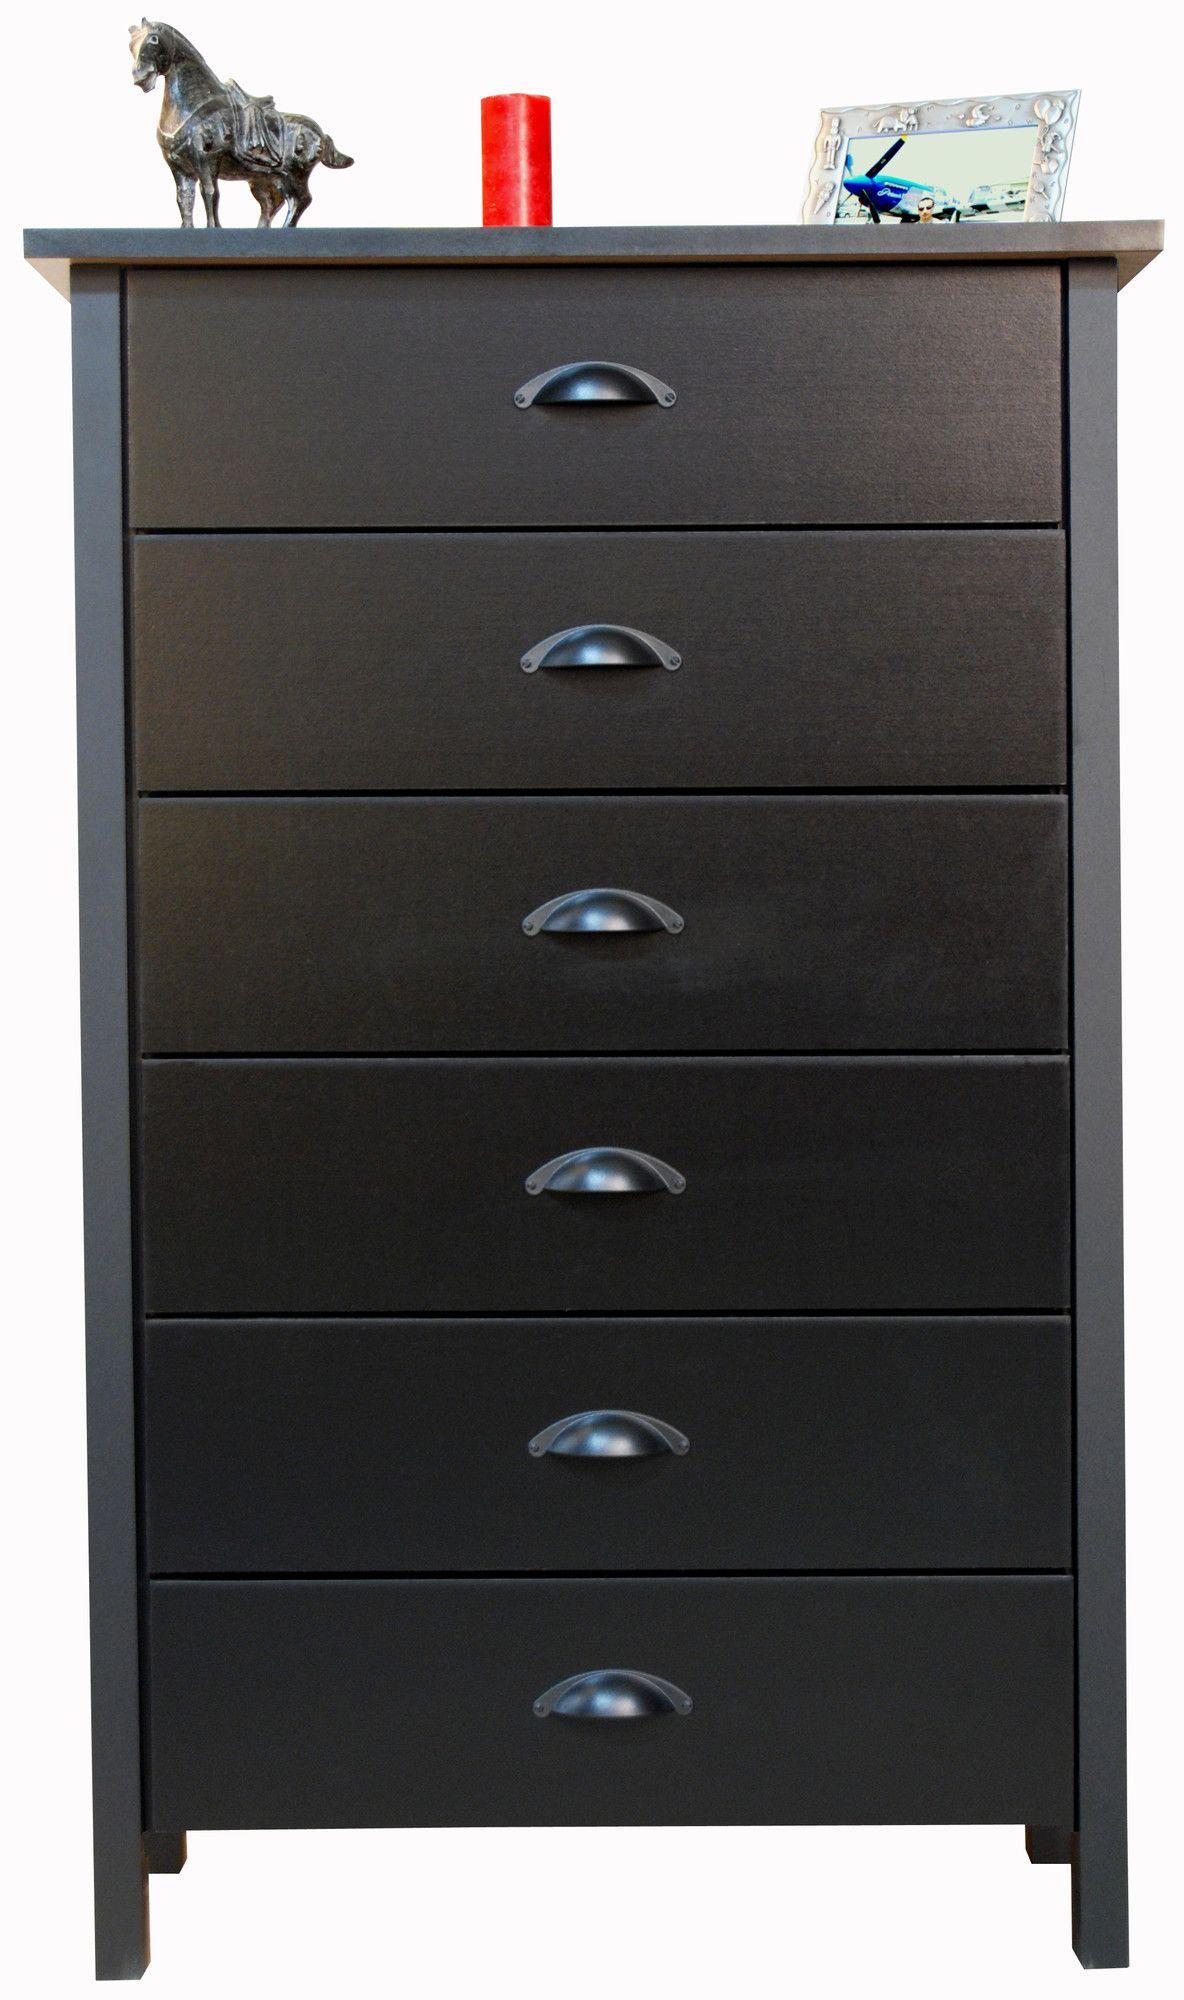 Venture Horizon Compressed Wood 6 Drawer Chest Dresser Drawers 6 Drawer Dresser Traditional Bedroom Furniture [ 2000 x 1184 Pixel ]